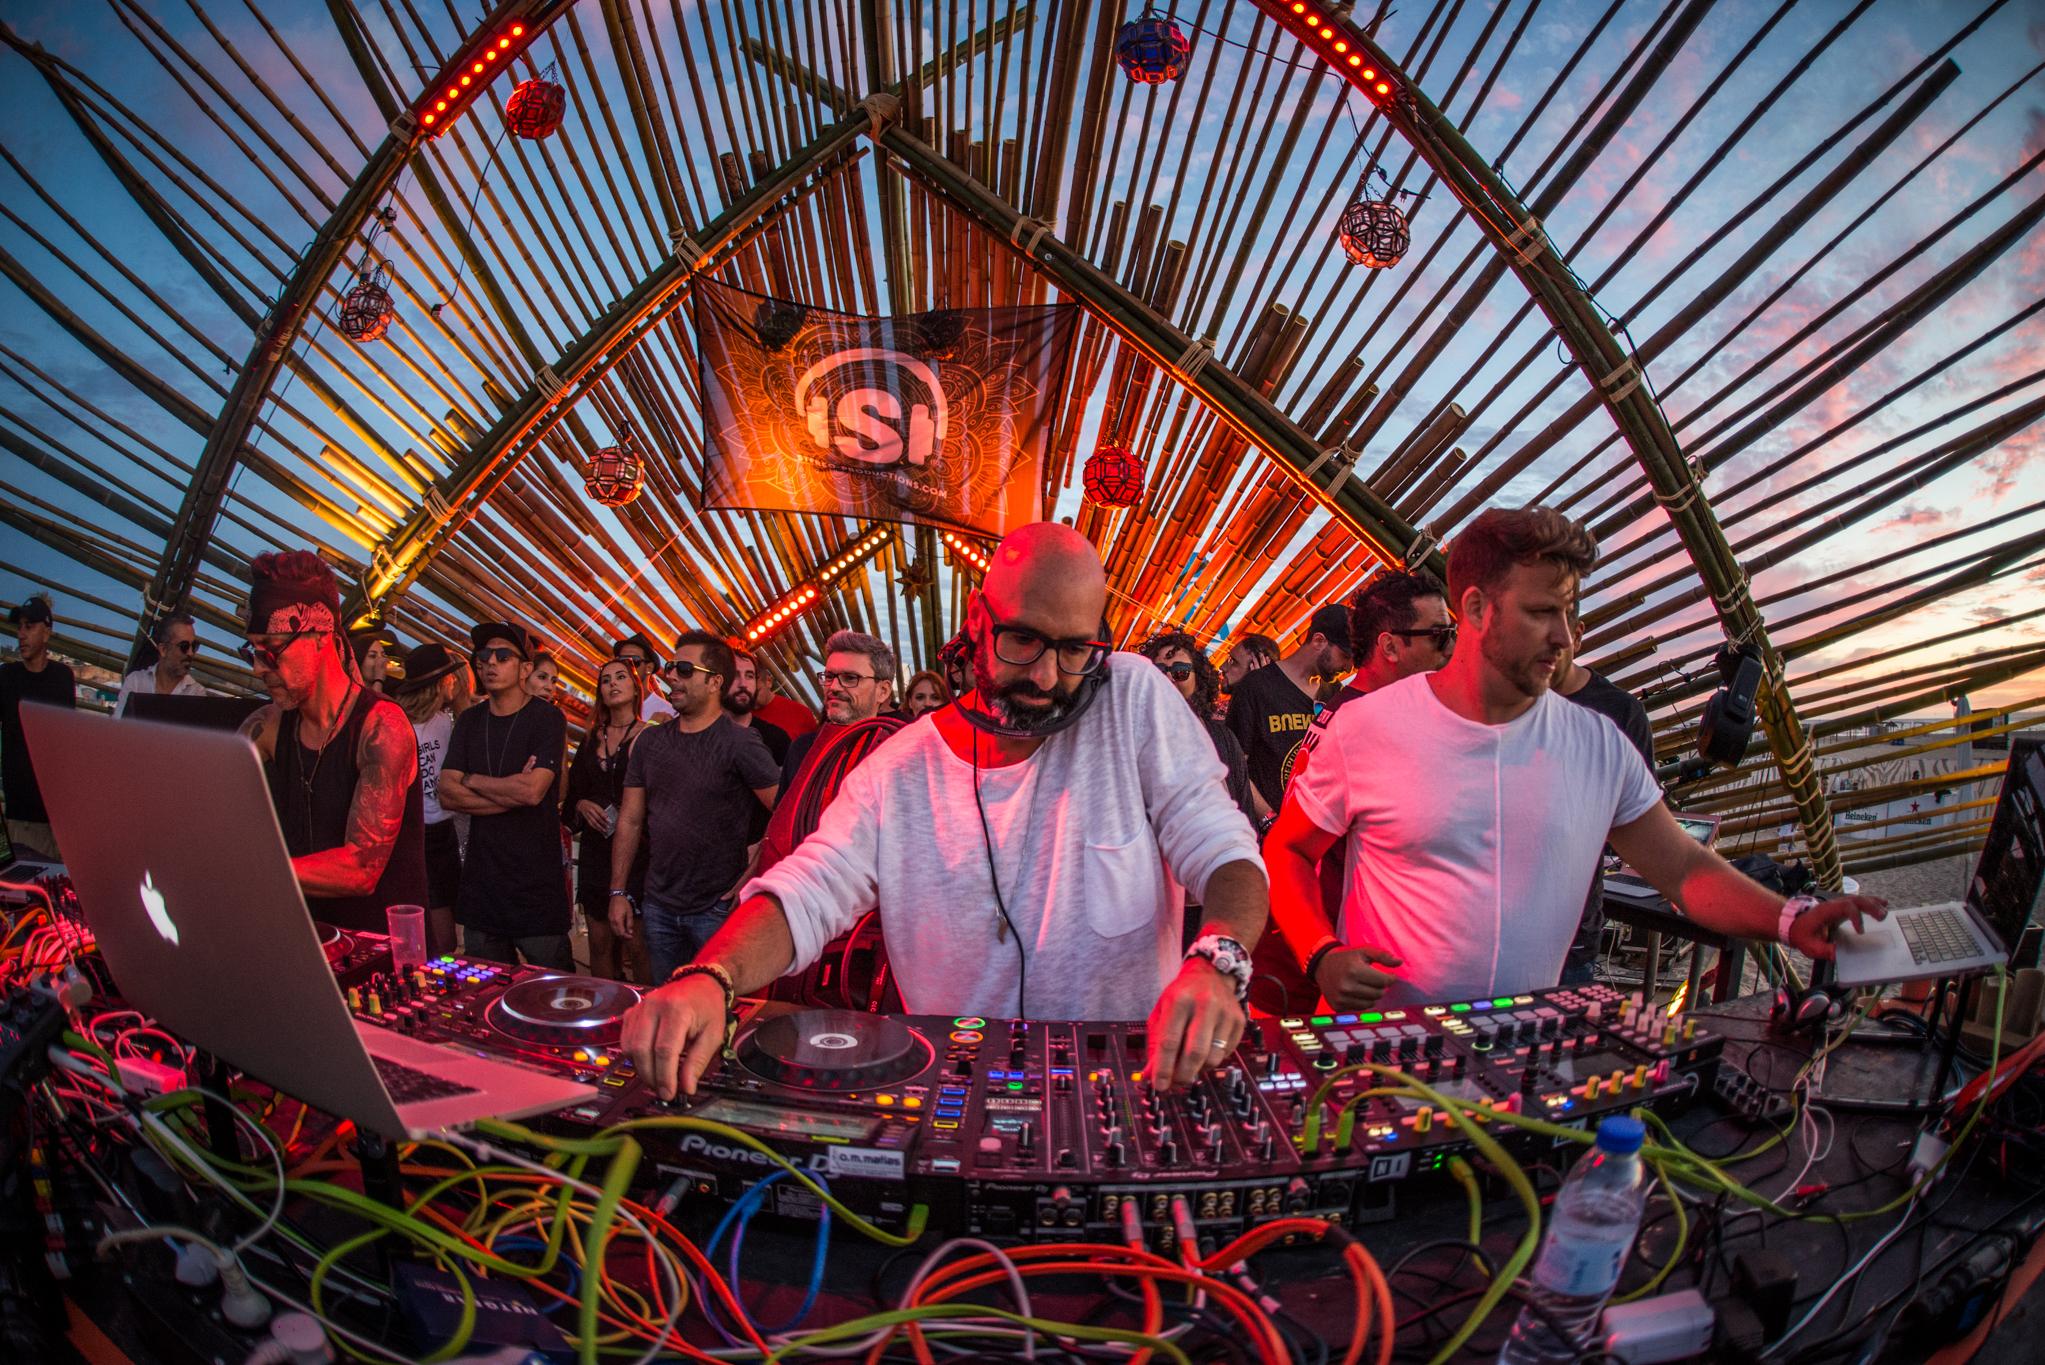 BPMPT17-Sept14-Blanco-StereoProd-ChusandCeballos_IMG8651.jpg